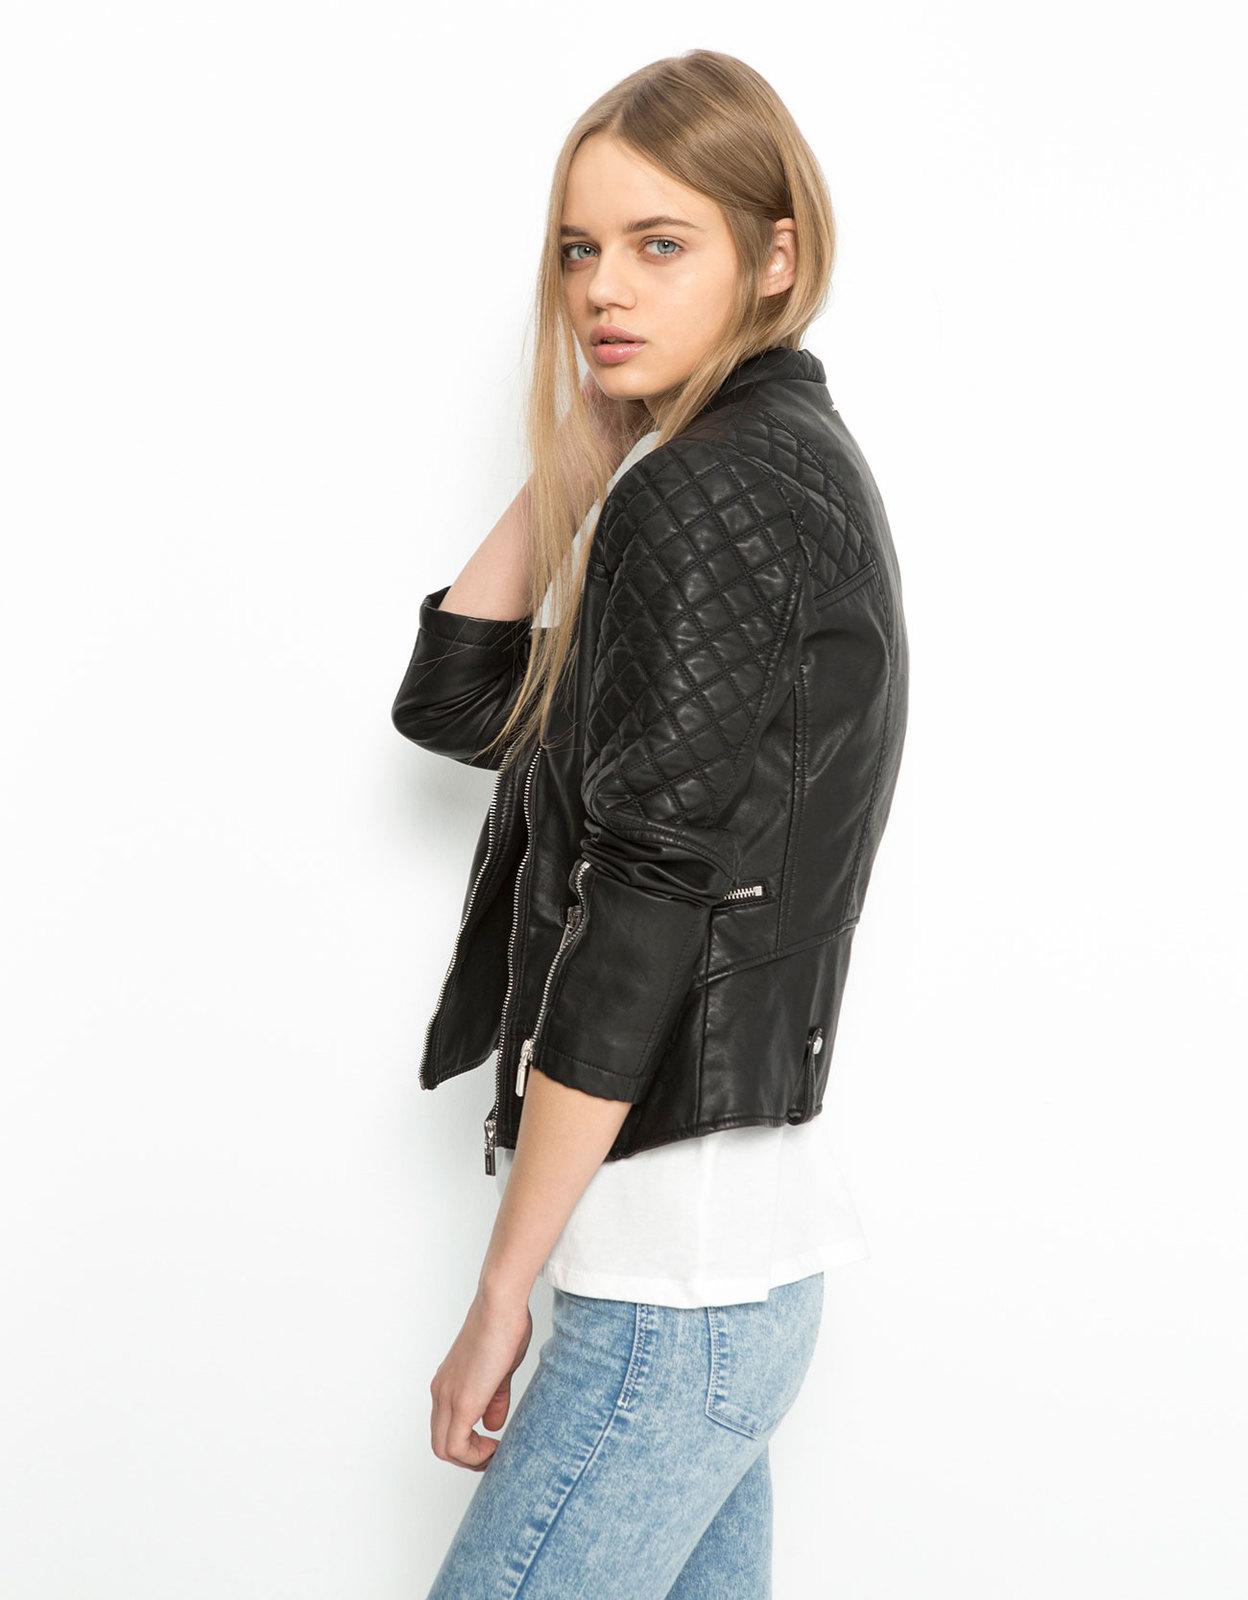 Bershka női fekete steppelt műbőr dzseki kép 599813c222